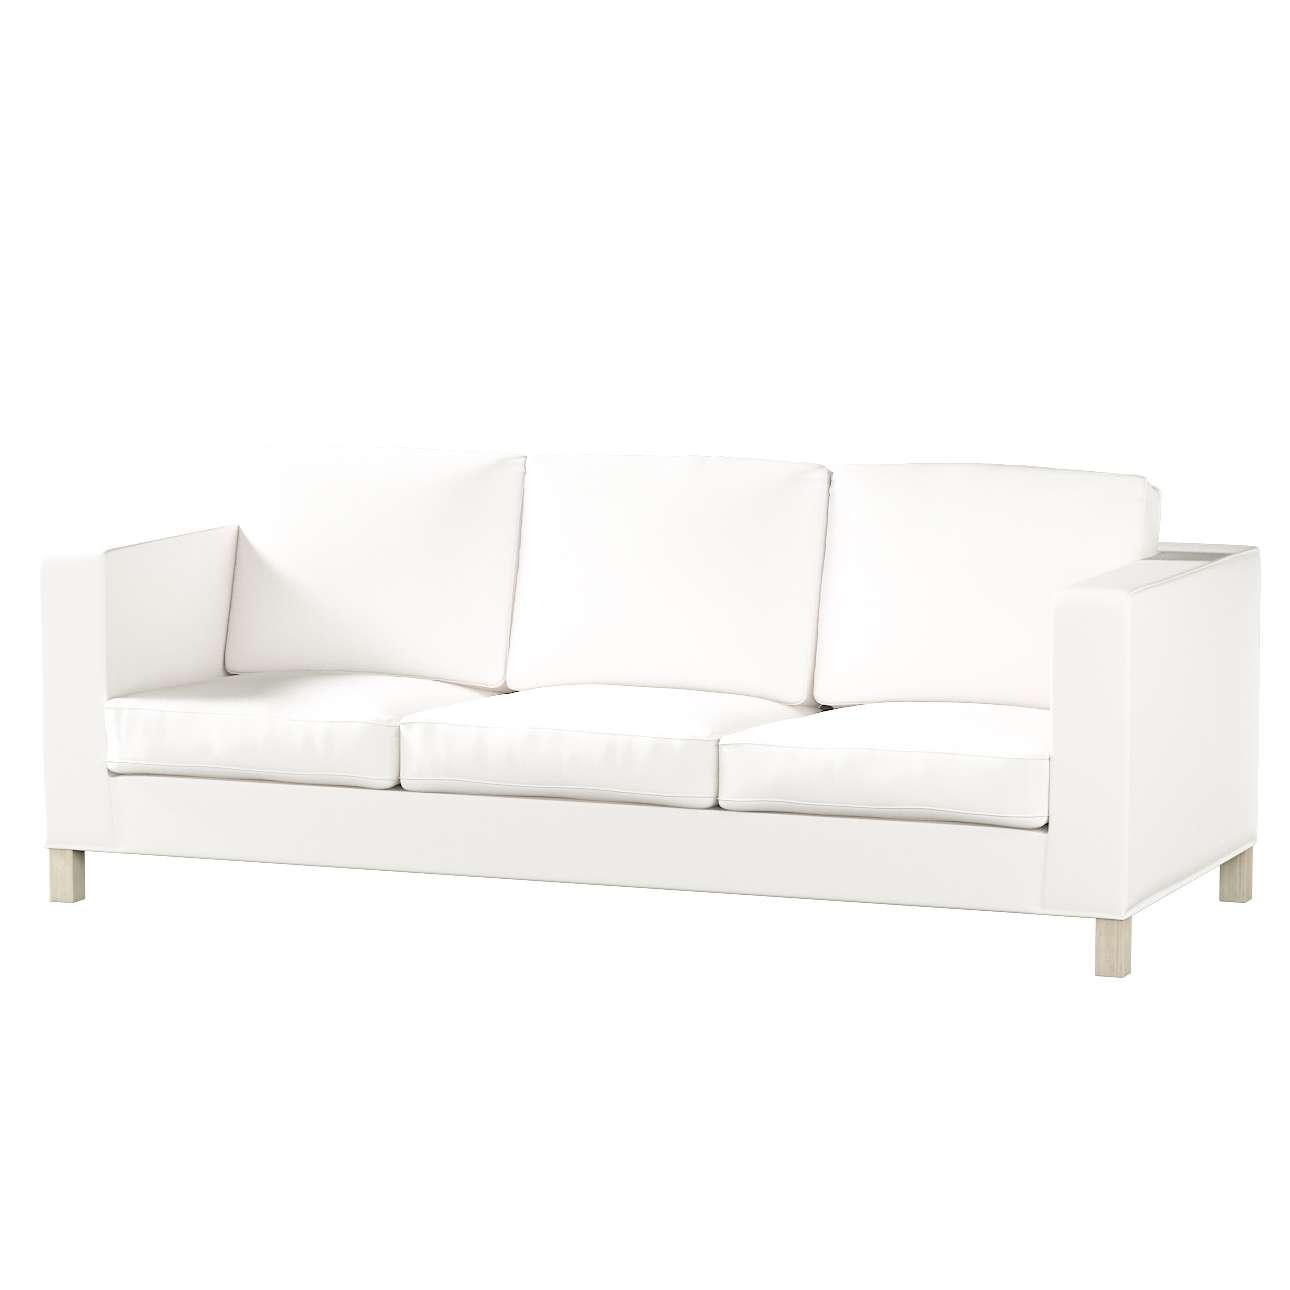 Karlanda 3 Seater Sofa Cover Pure White 702 34 Karlanda 3 Seat